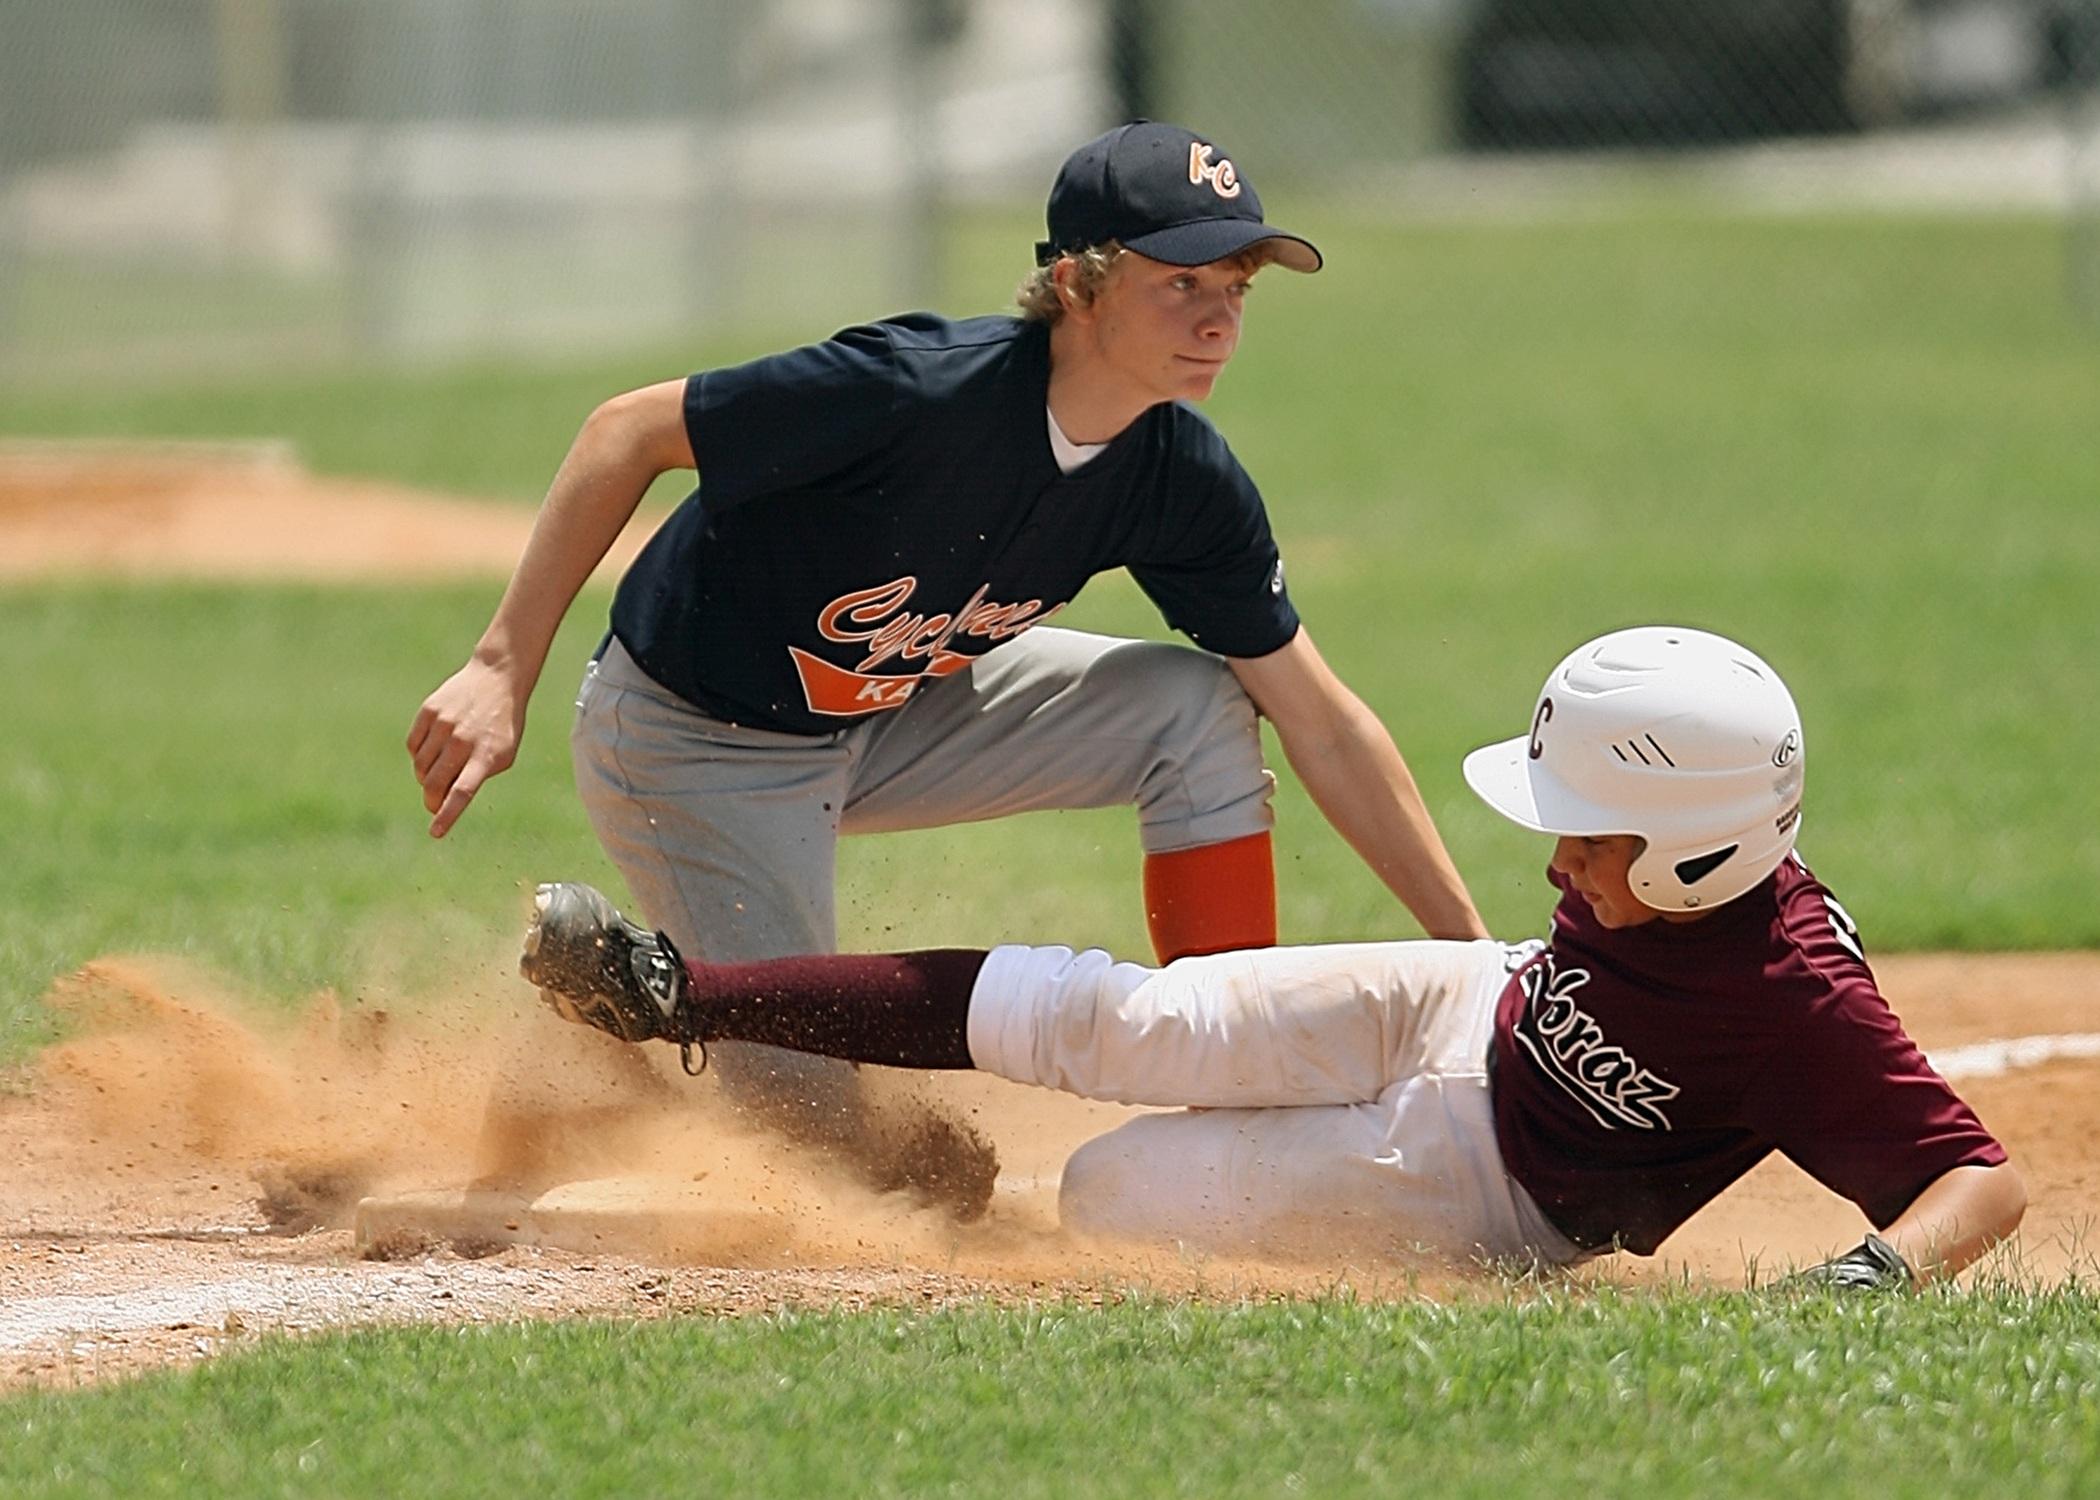 Action american athlete athletes